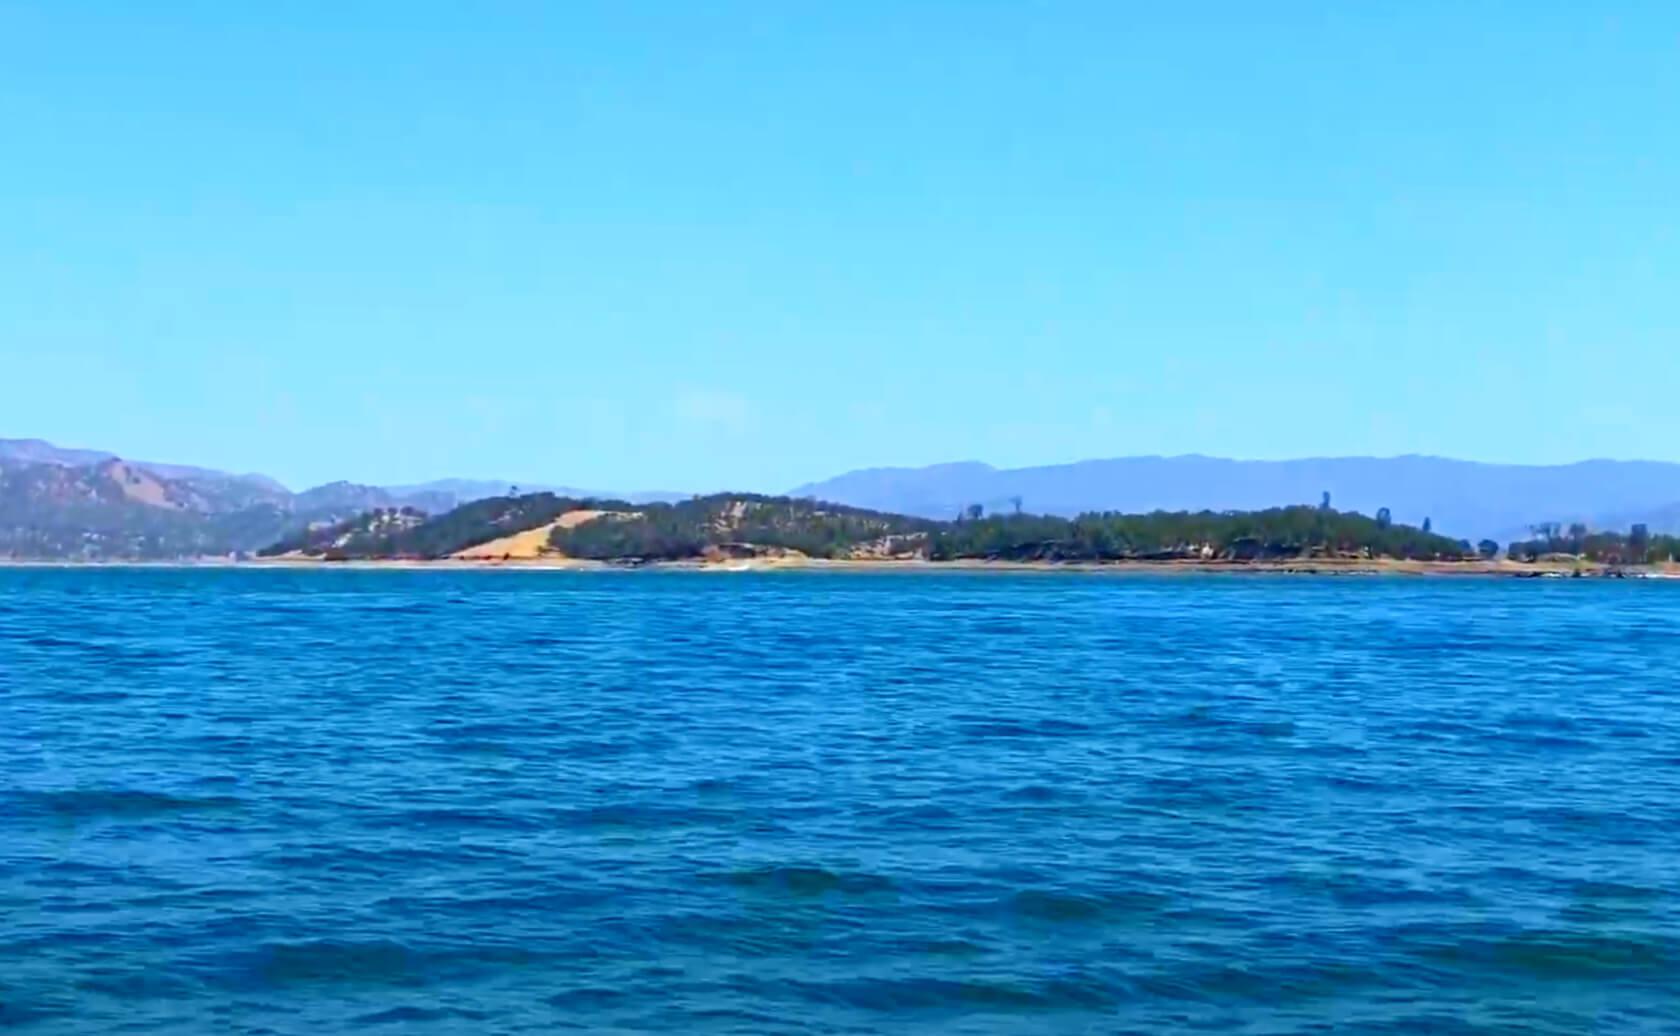 Lake-Berryessa-Fishing-Guide-Report-Napa-CA-07